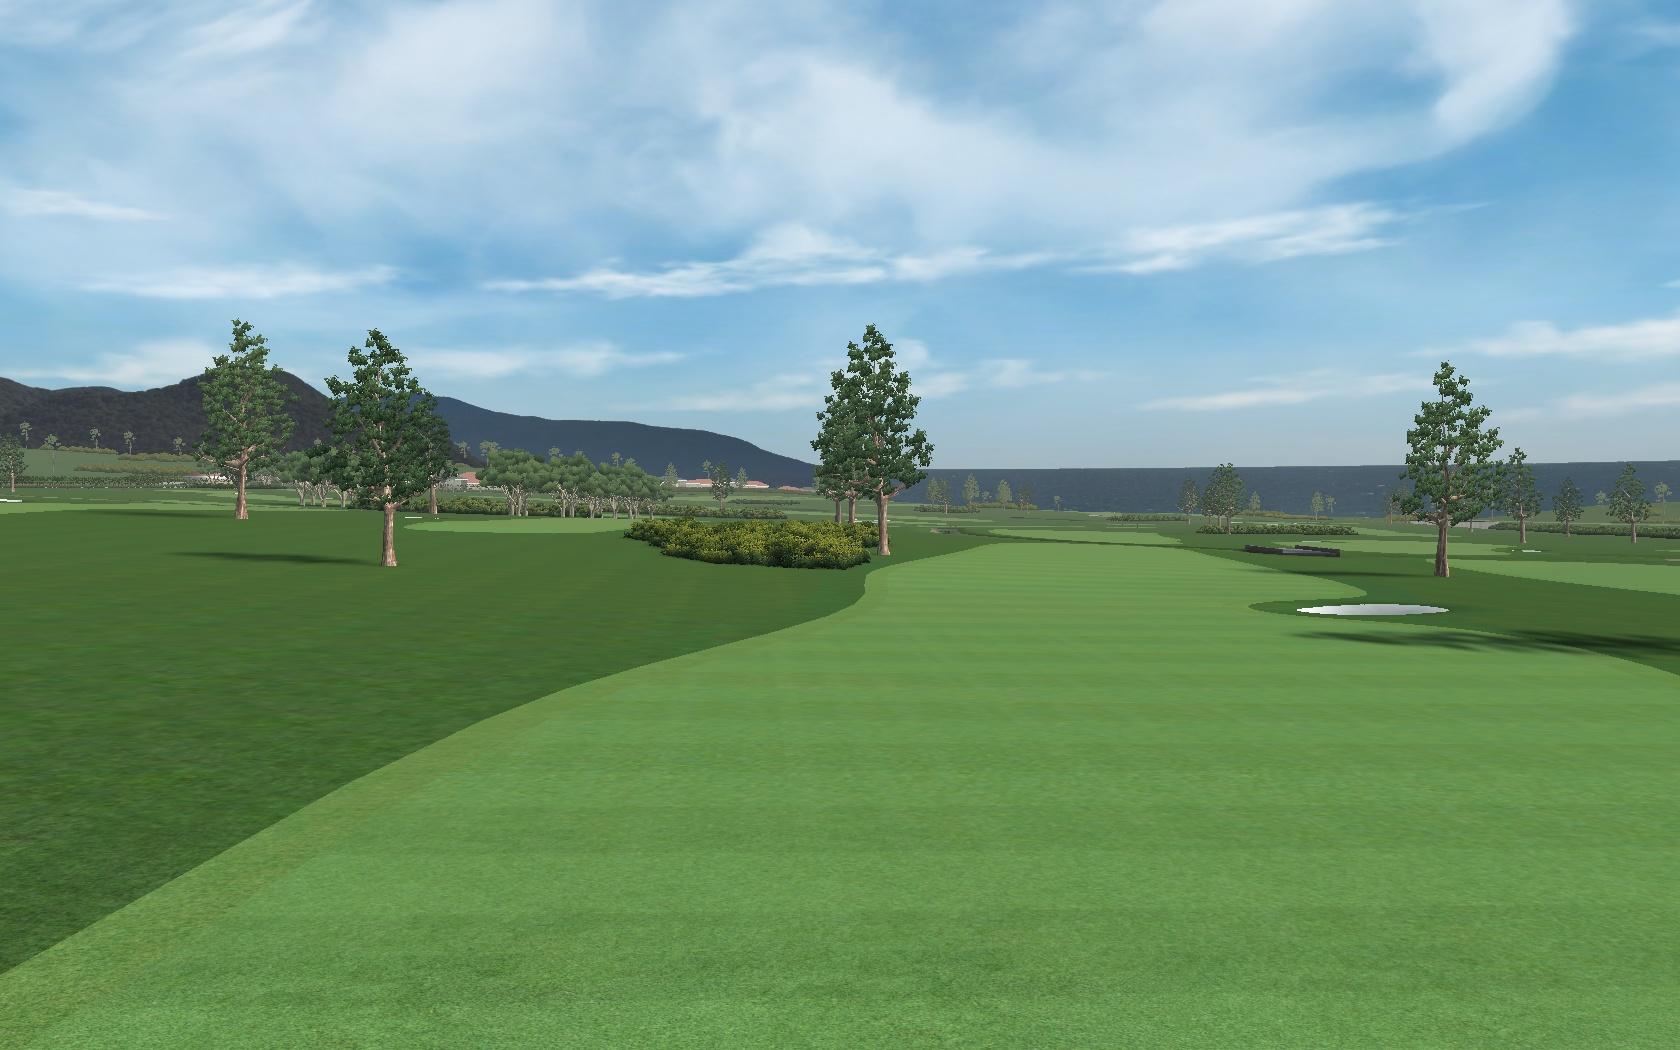 Picture of Maesdu (Llandudno) Golf Club - click to view original size